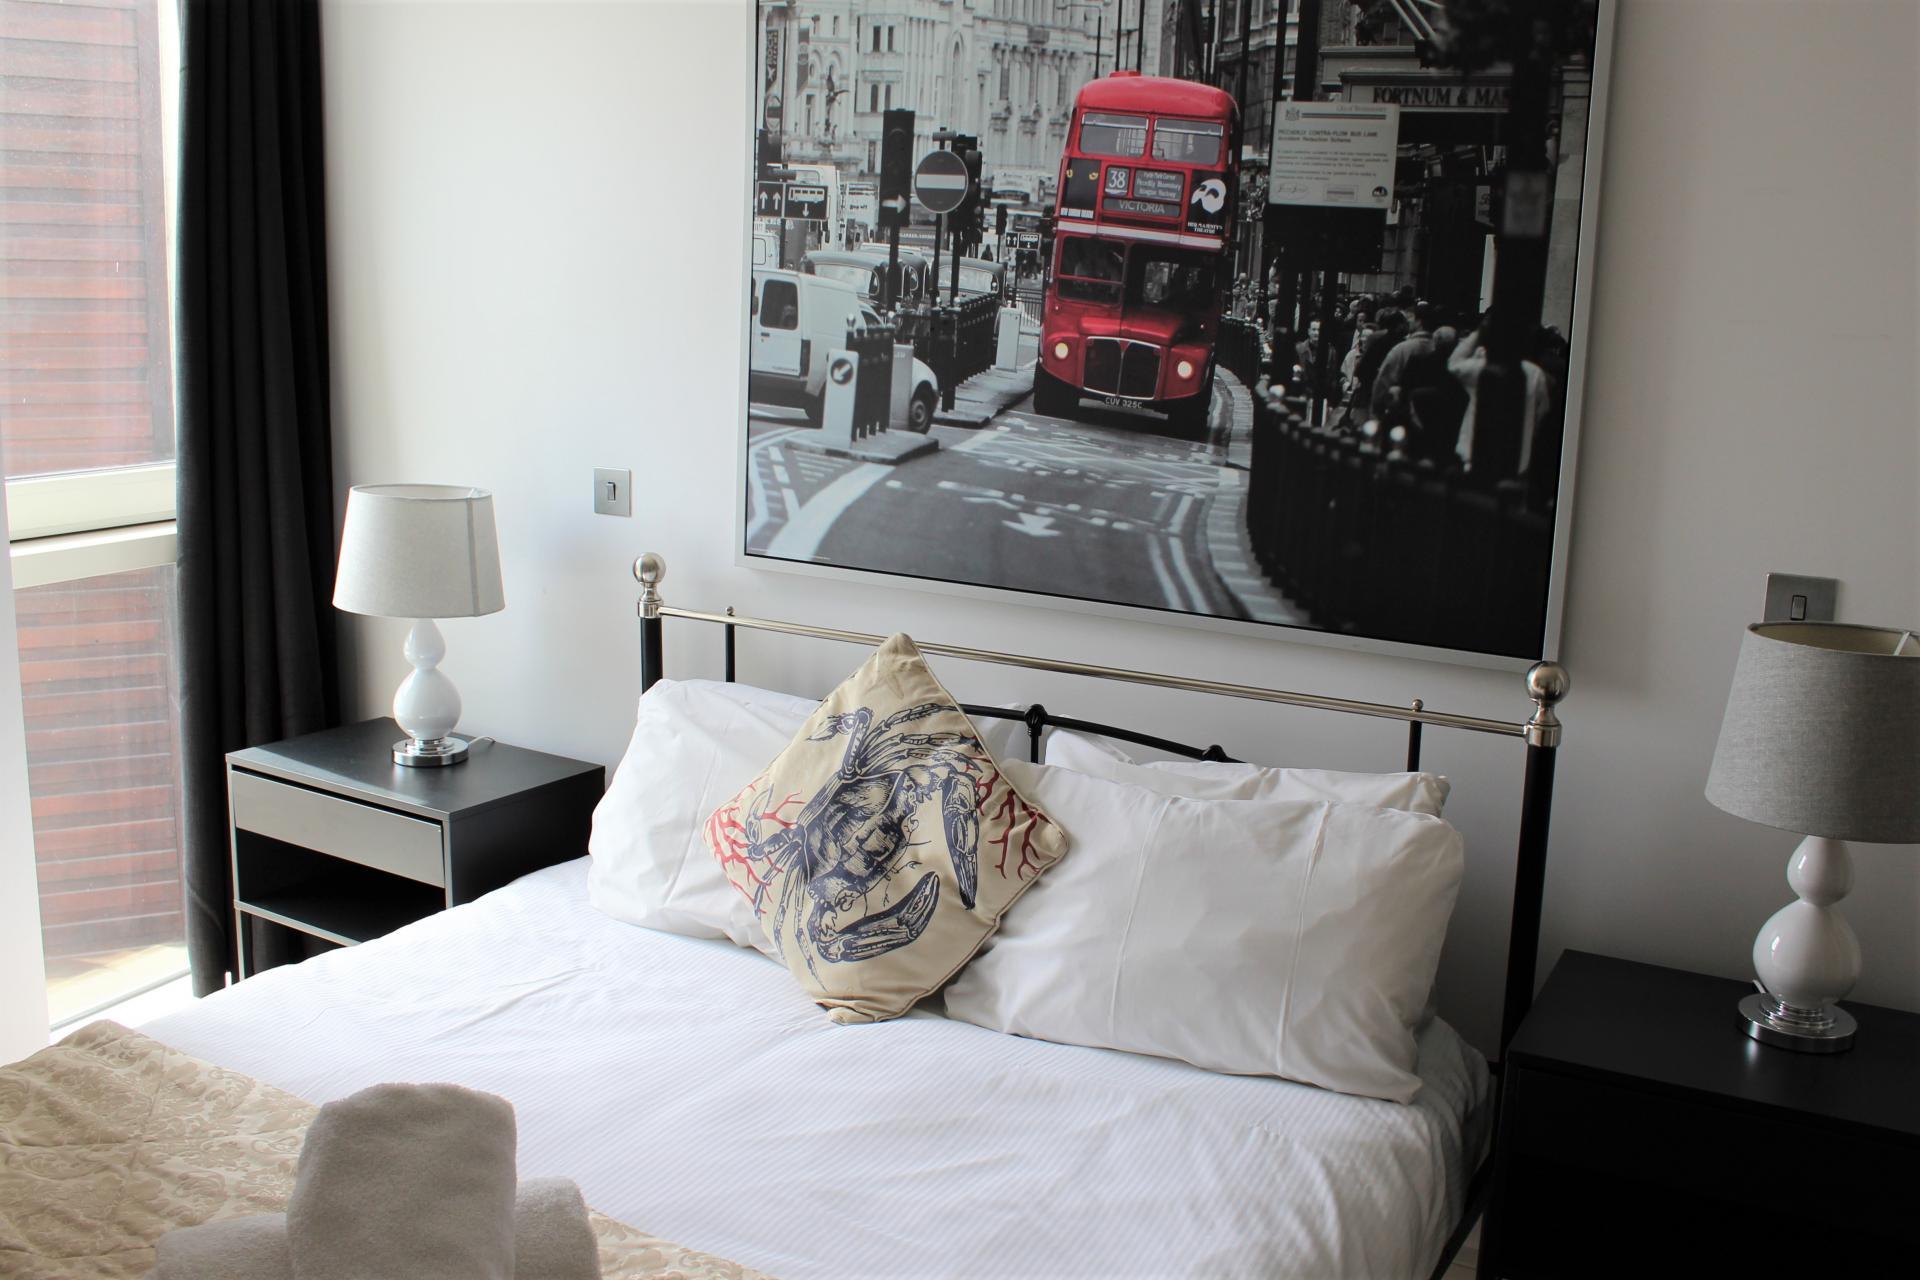 Bed at Gunwharf Quays Apartments, Gunwharf Quays, Portsmouth - Citybase Apartments